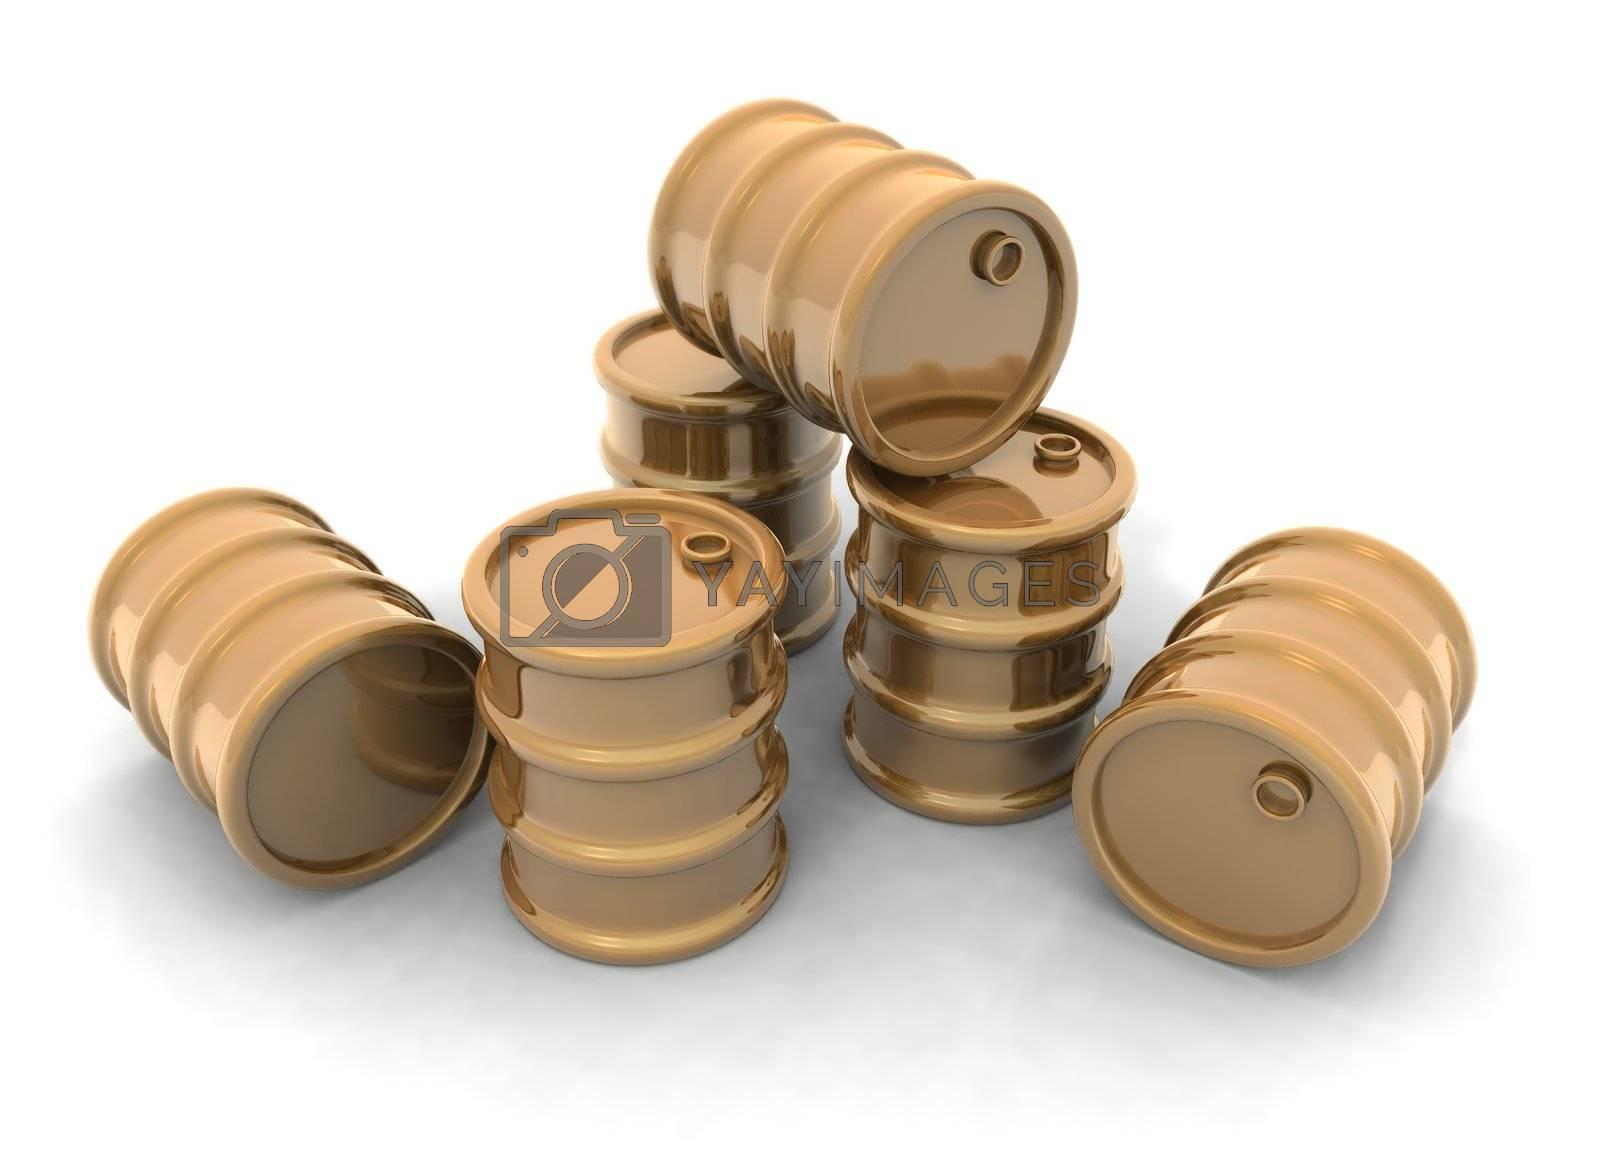 a 3D rendering of some golden barrels